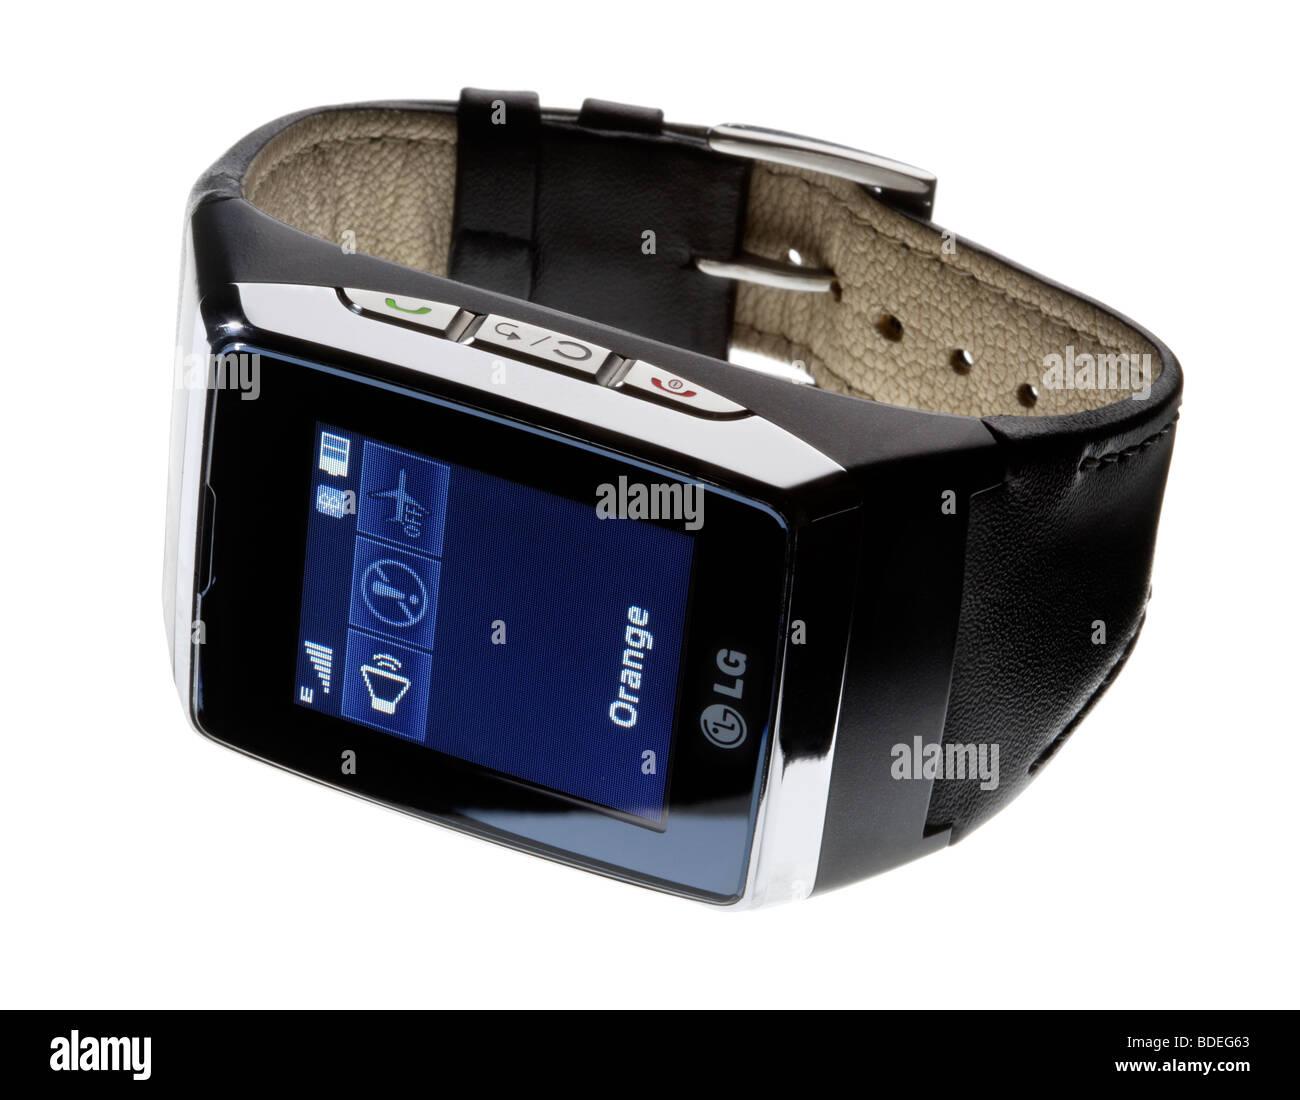 LG wristwatch mobile phone - Stock Image